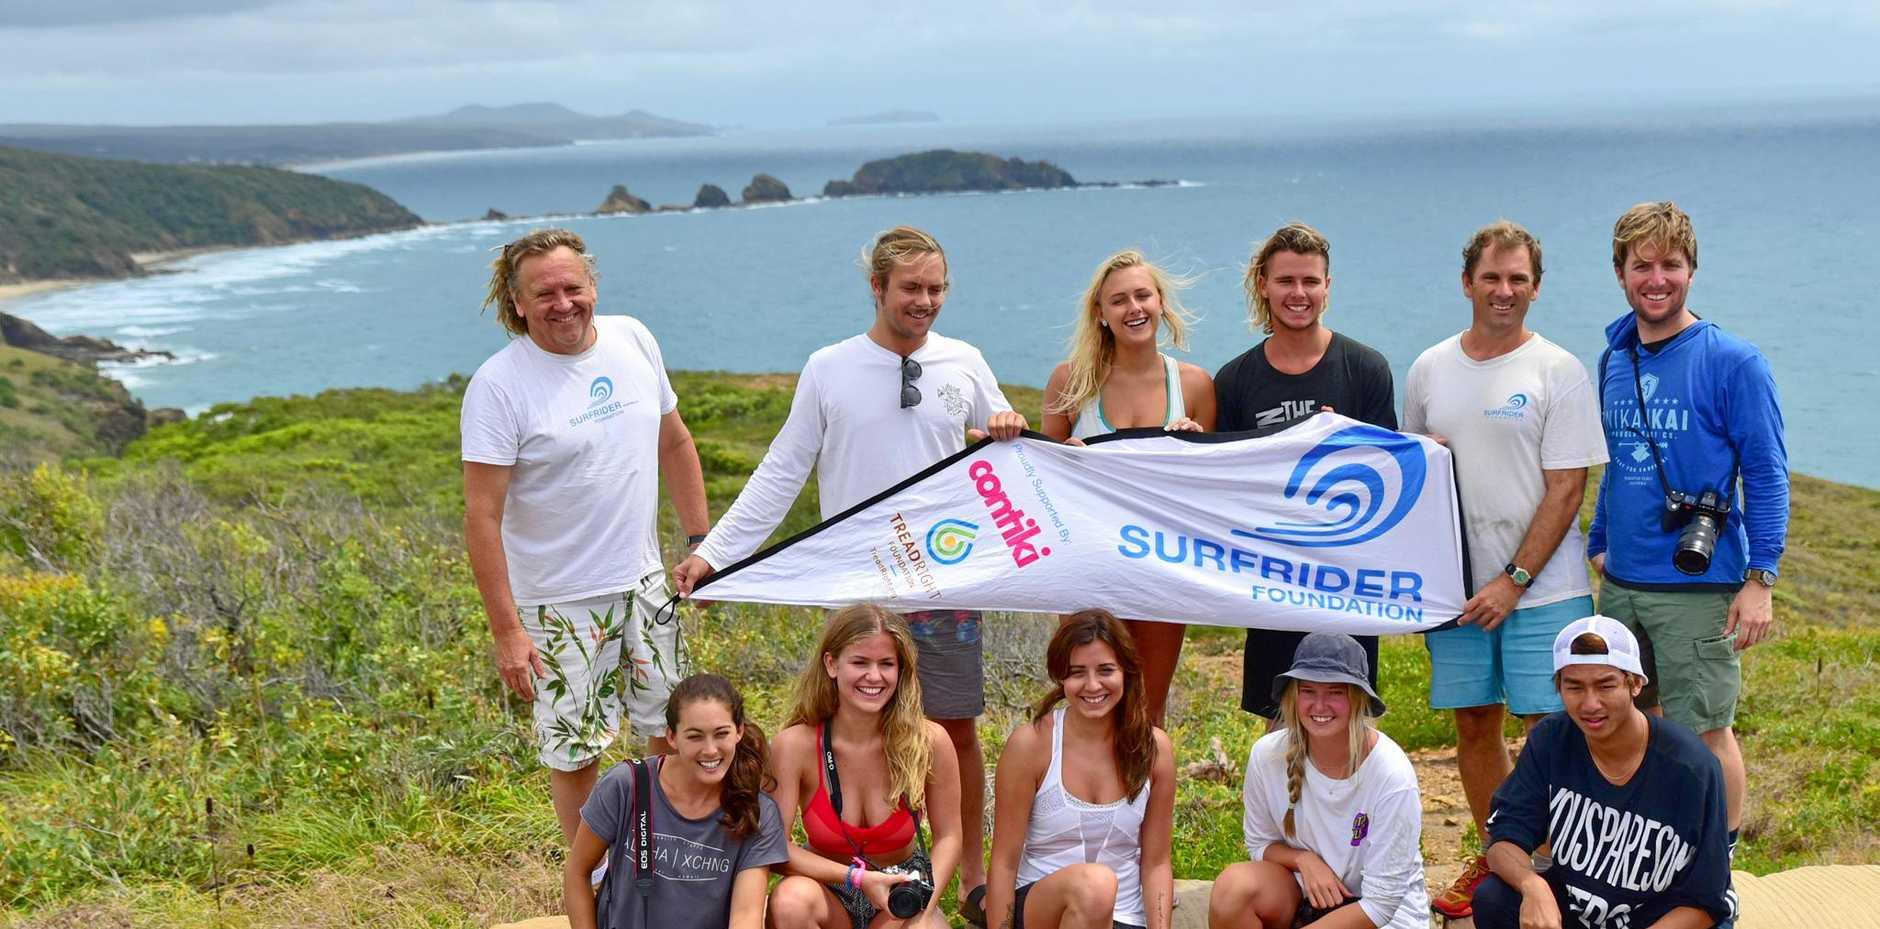 KEEPING IT BEAUTIFUL: The Surfrider Foundation-Contiki Storytellers 2015 Beach Clean up included; back row Brendan Donodue (Surfrider Foundation Northern Branches Sydney, National ex-Chairman), D'arcy Dineen (Noosa), Elli-Jean Coffey (Coolangatta), Jackson Coffey (Coolangatta), John McGrath (Surfrider Foundation Capricorn Coast), Pete Halvorsen (LA, USA)Front row L-R: Chelsea Yamase (Hawaii), Mollie Bylett (UK), Jordan Dyck (Canada), Jamie McDell (NZ), Masato Yukawa (Japan).